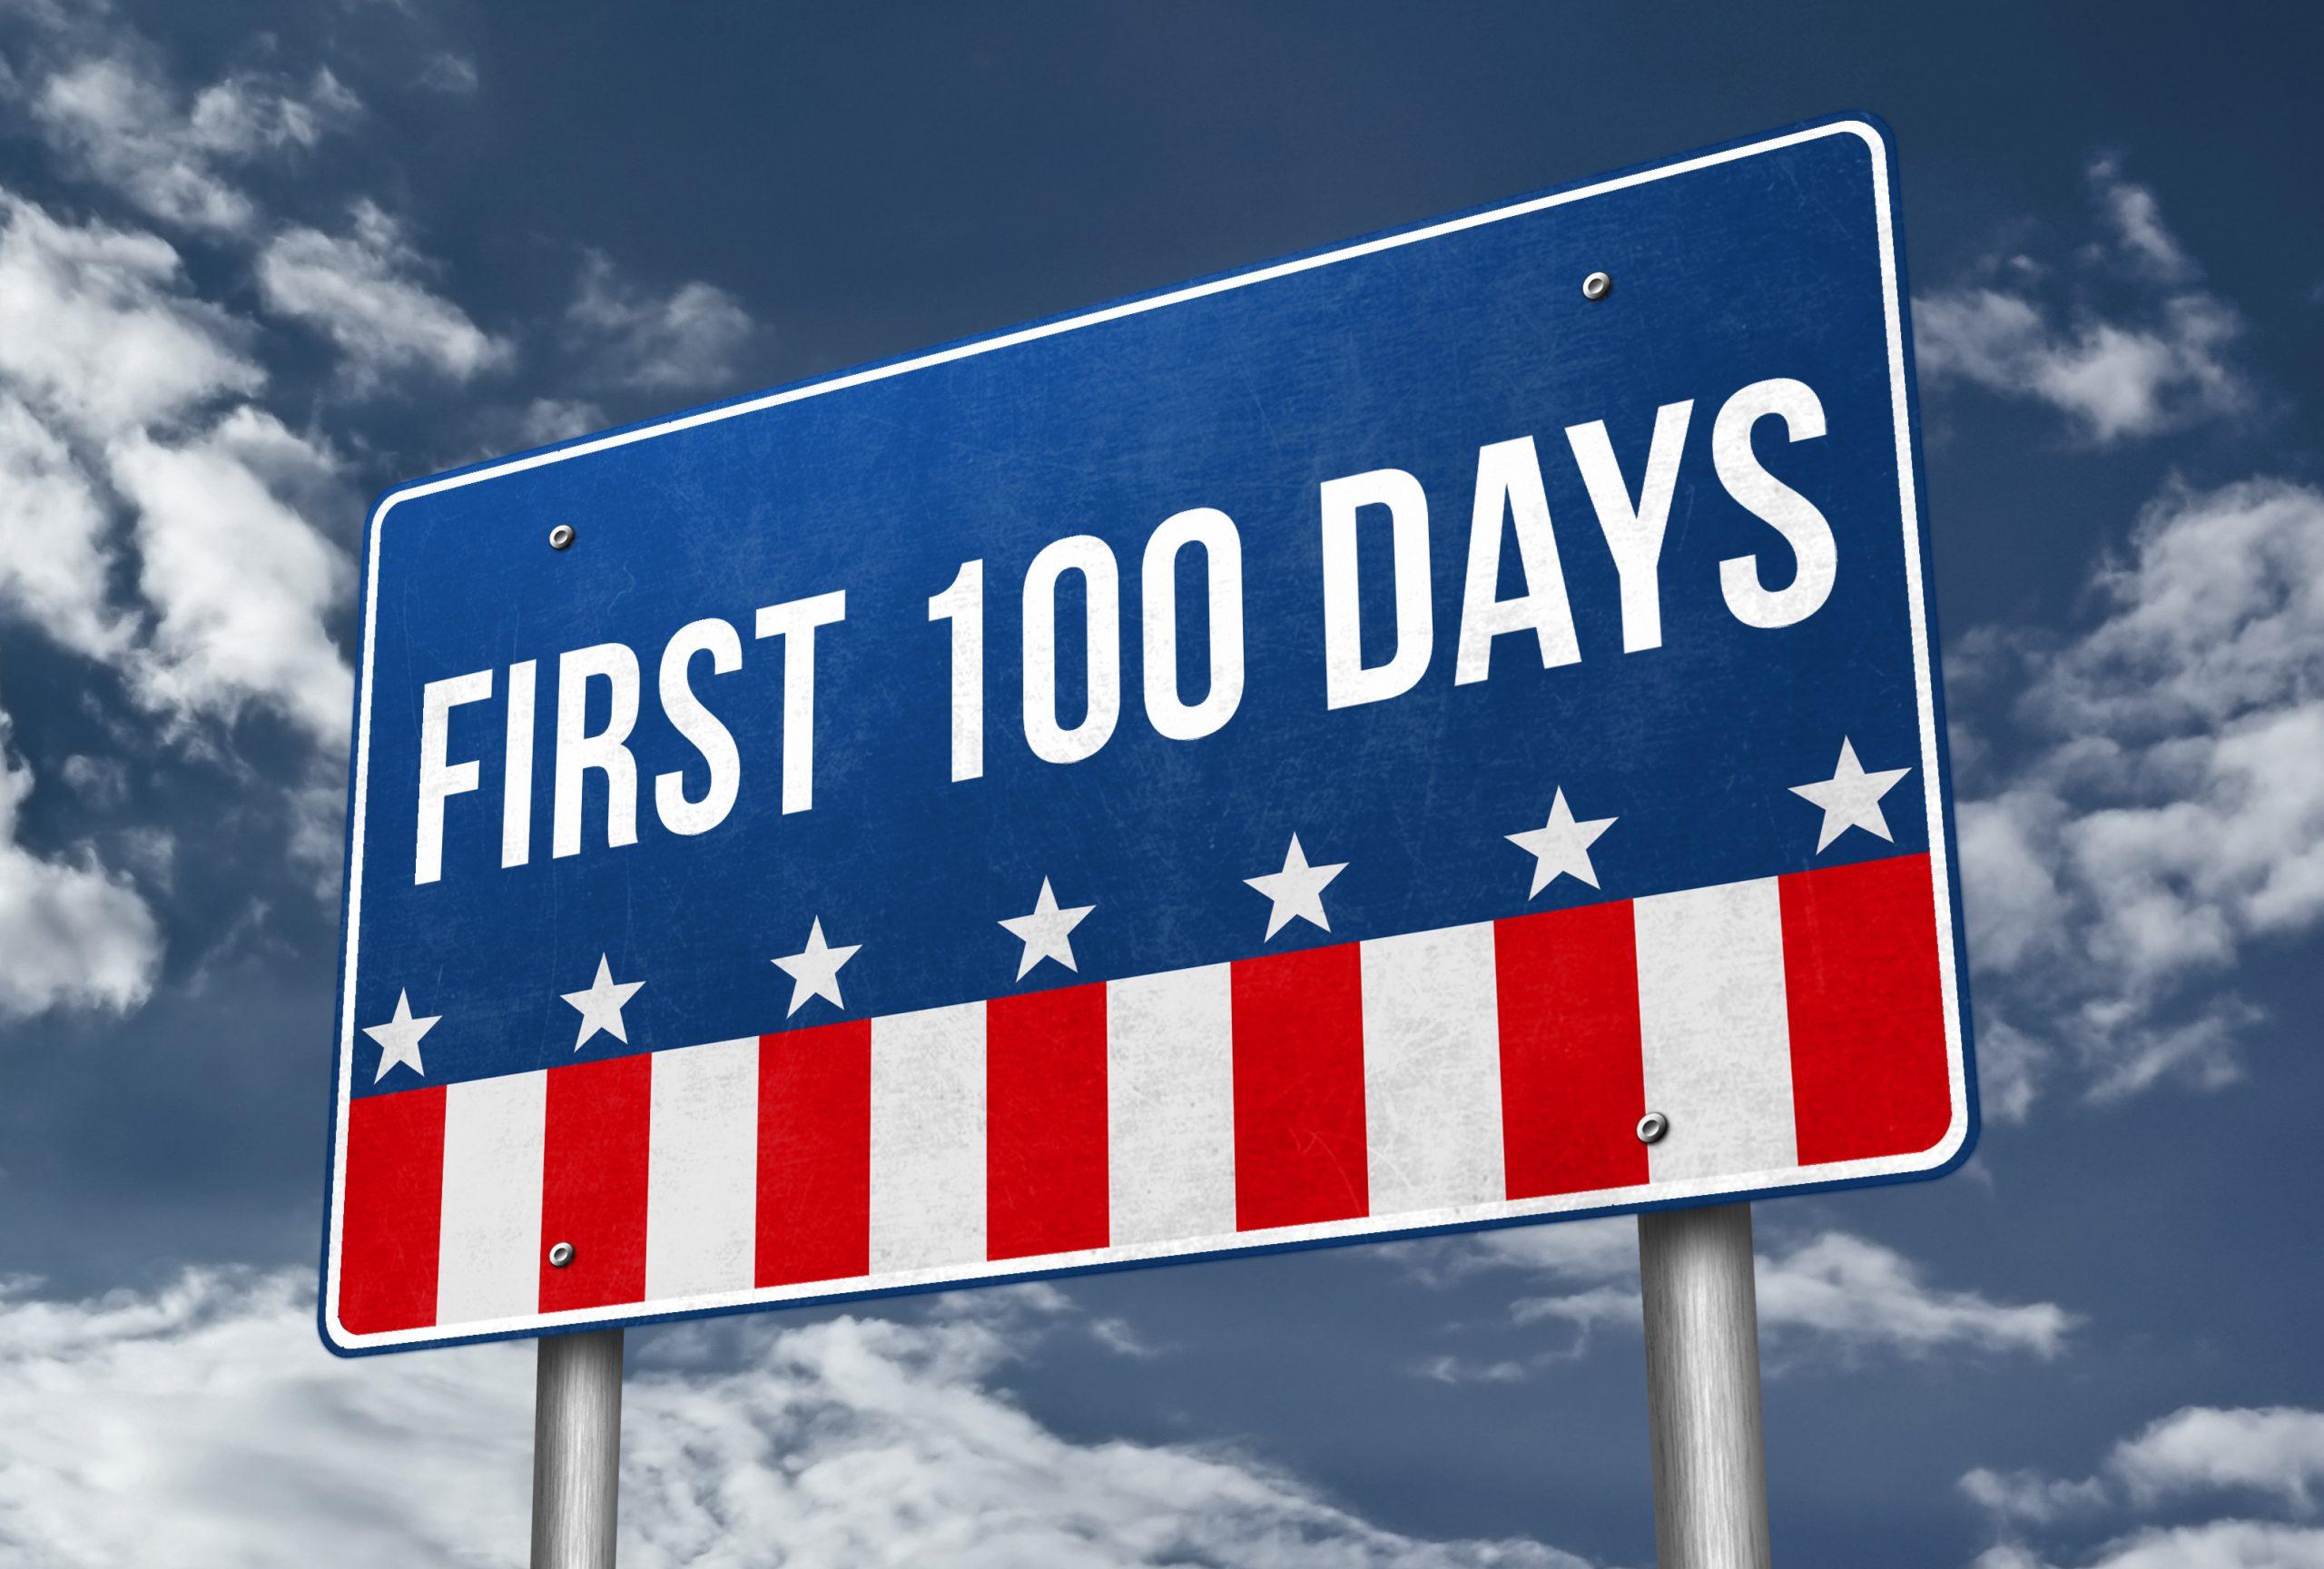 Biden's First 100 Days: Lawless Liberalism 😟